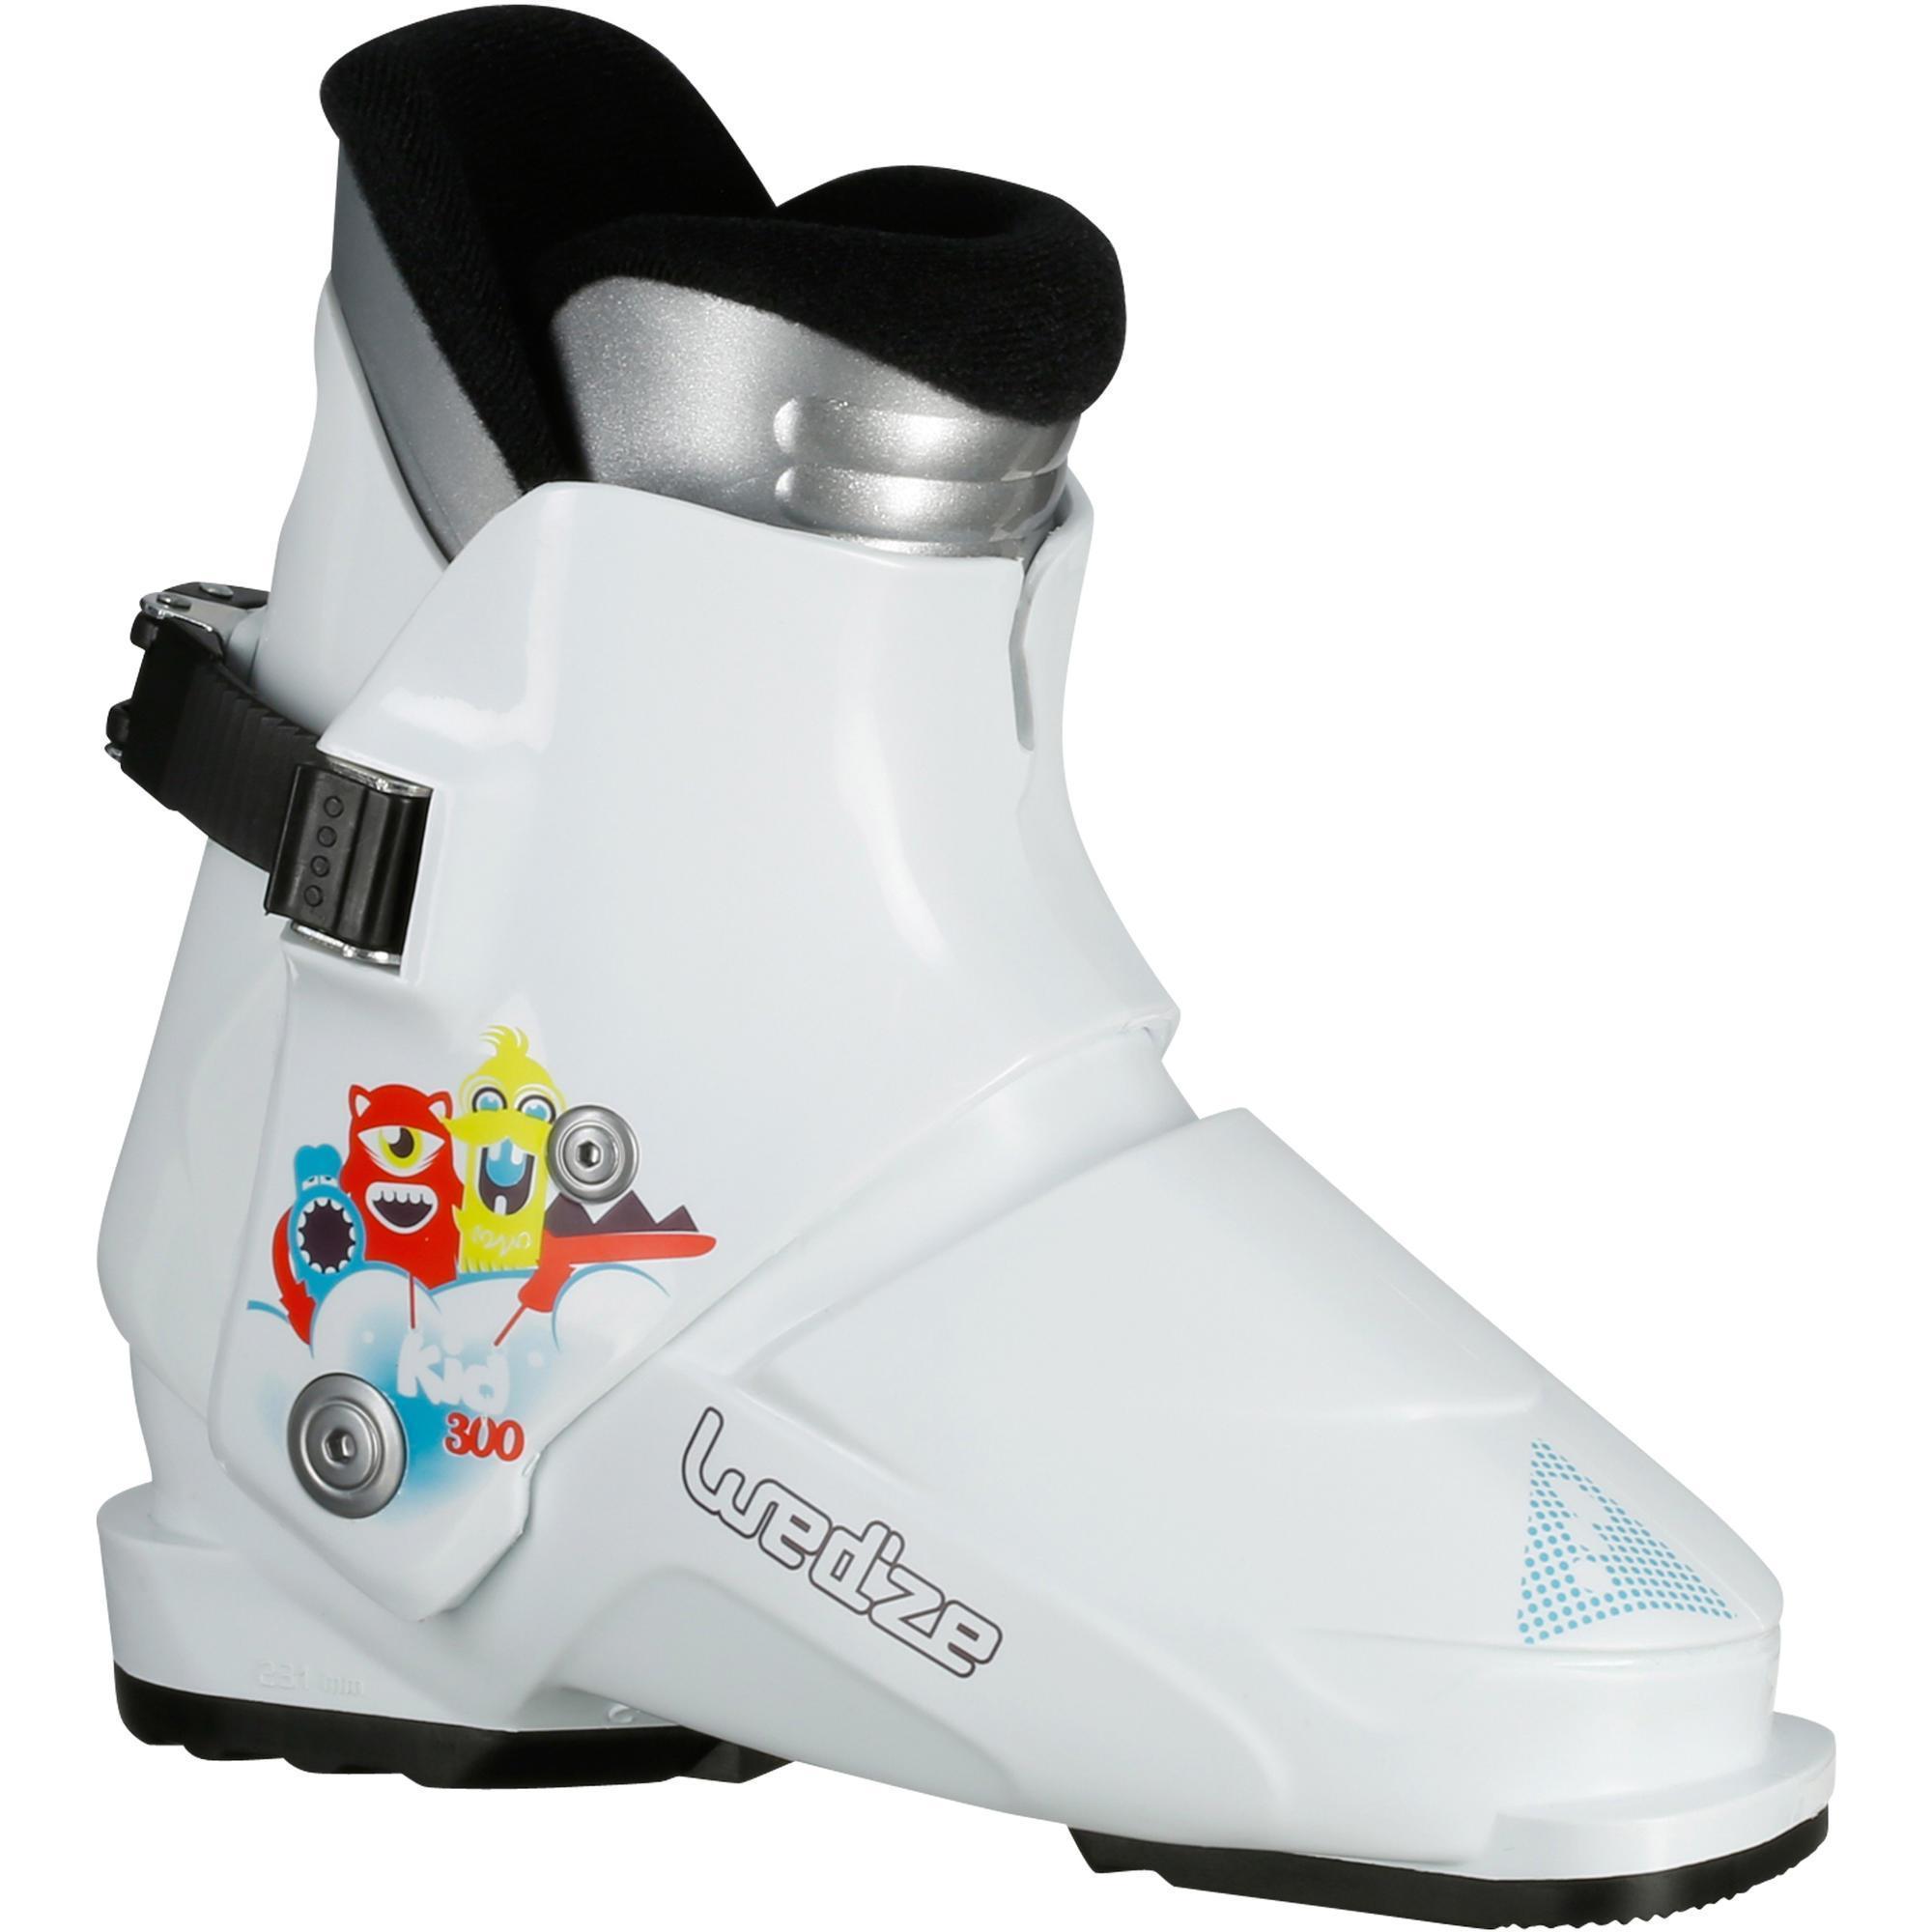 chaussures de ski enfant kid 300 blanches wedze. Black Bedroom Furniture Sets. Home Design Ideas